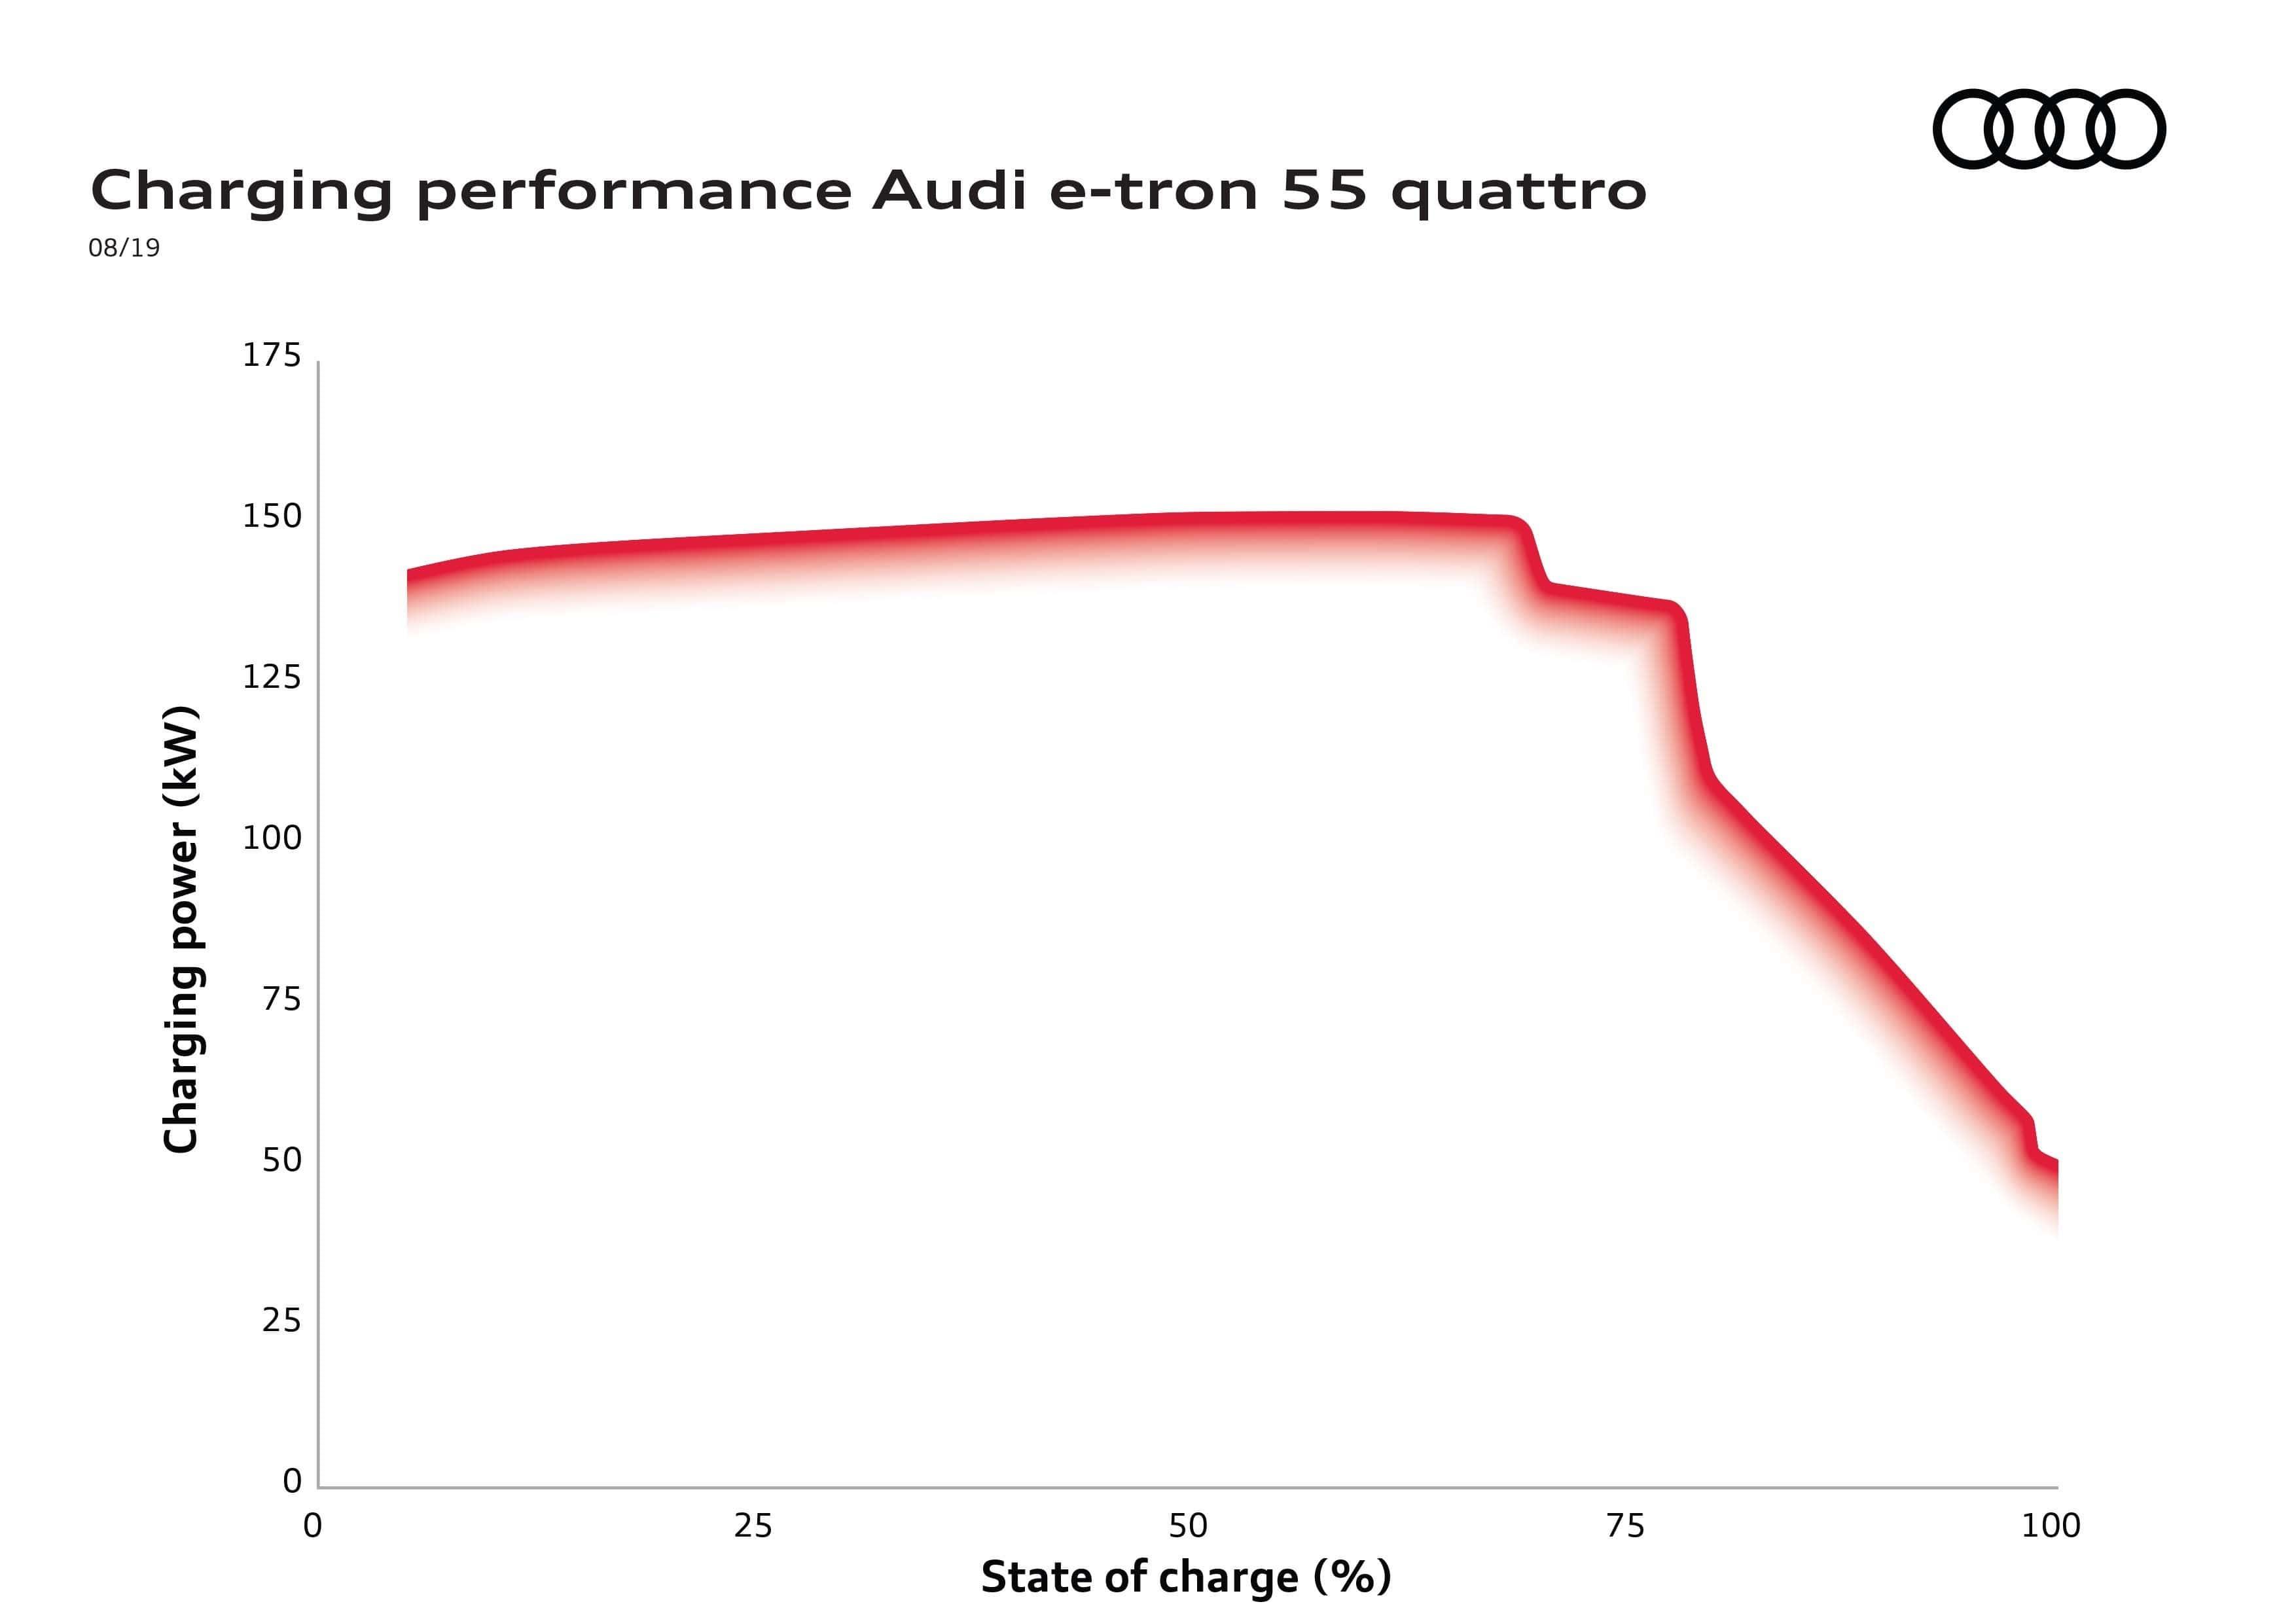 Audi e-tron υπεροχή στην ταχύτητα φόρτισης - Καμπύλη φόρτισης